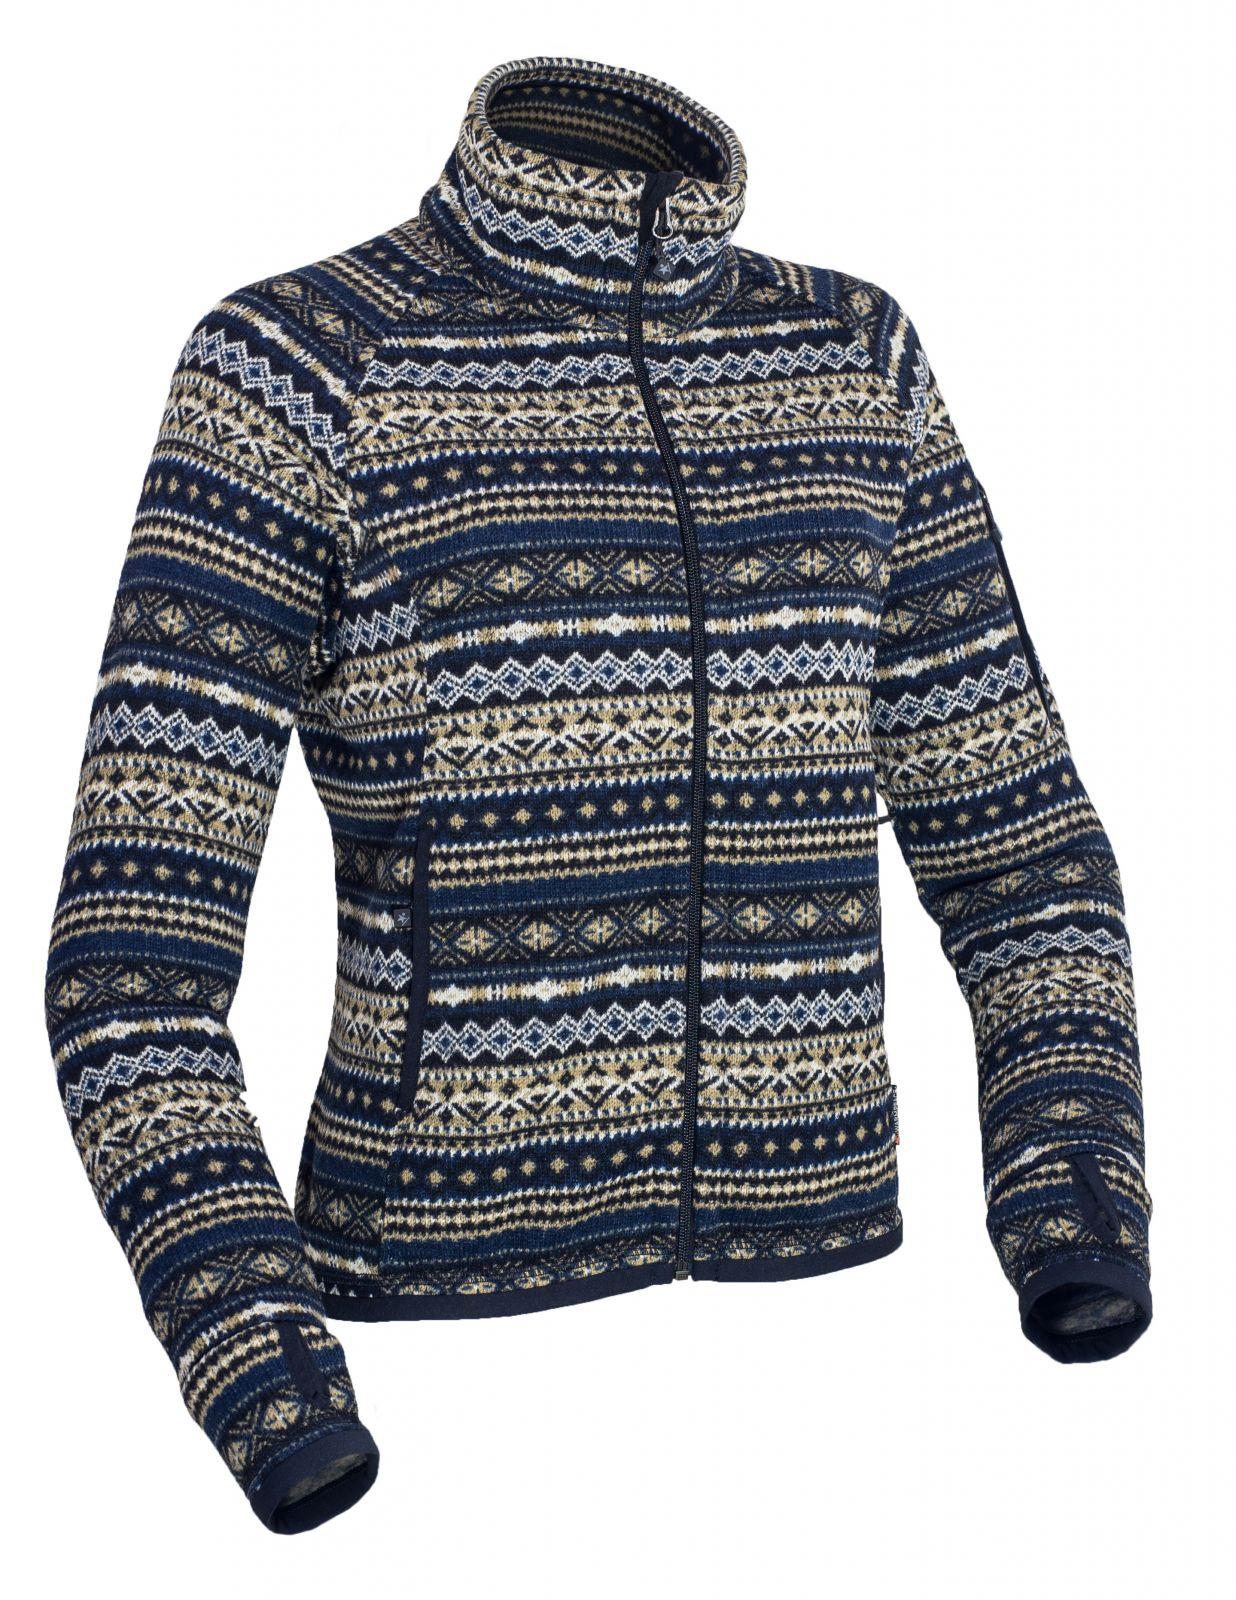 Warmpeace Norwega lady navy dámská bunda z fleecového materiálu se svetrovým vzorem